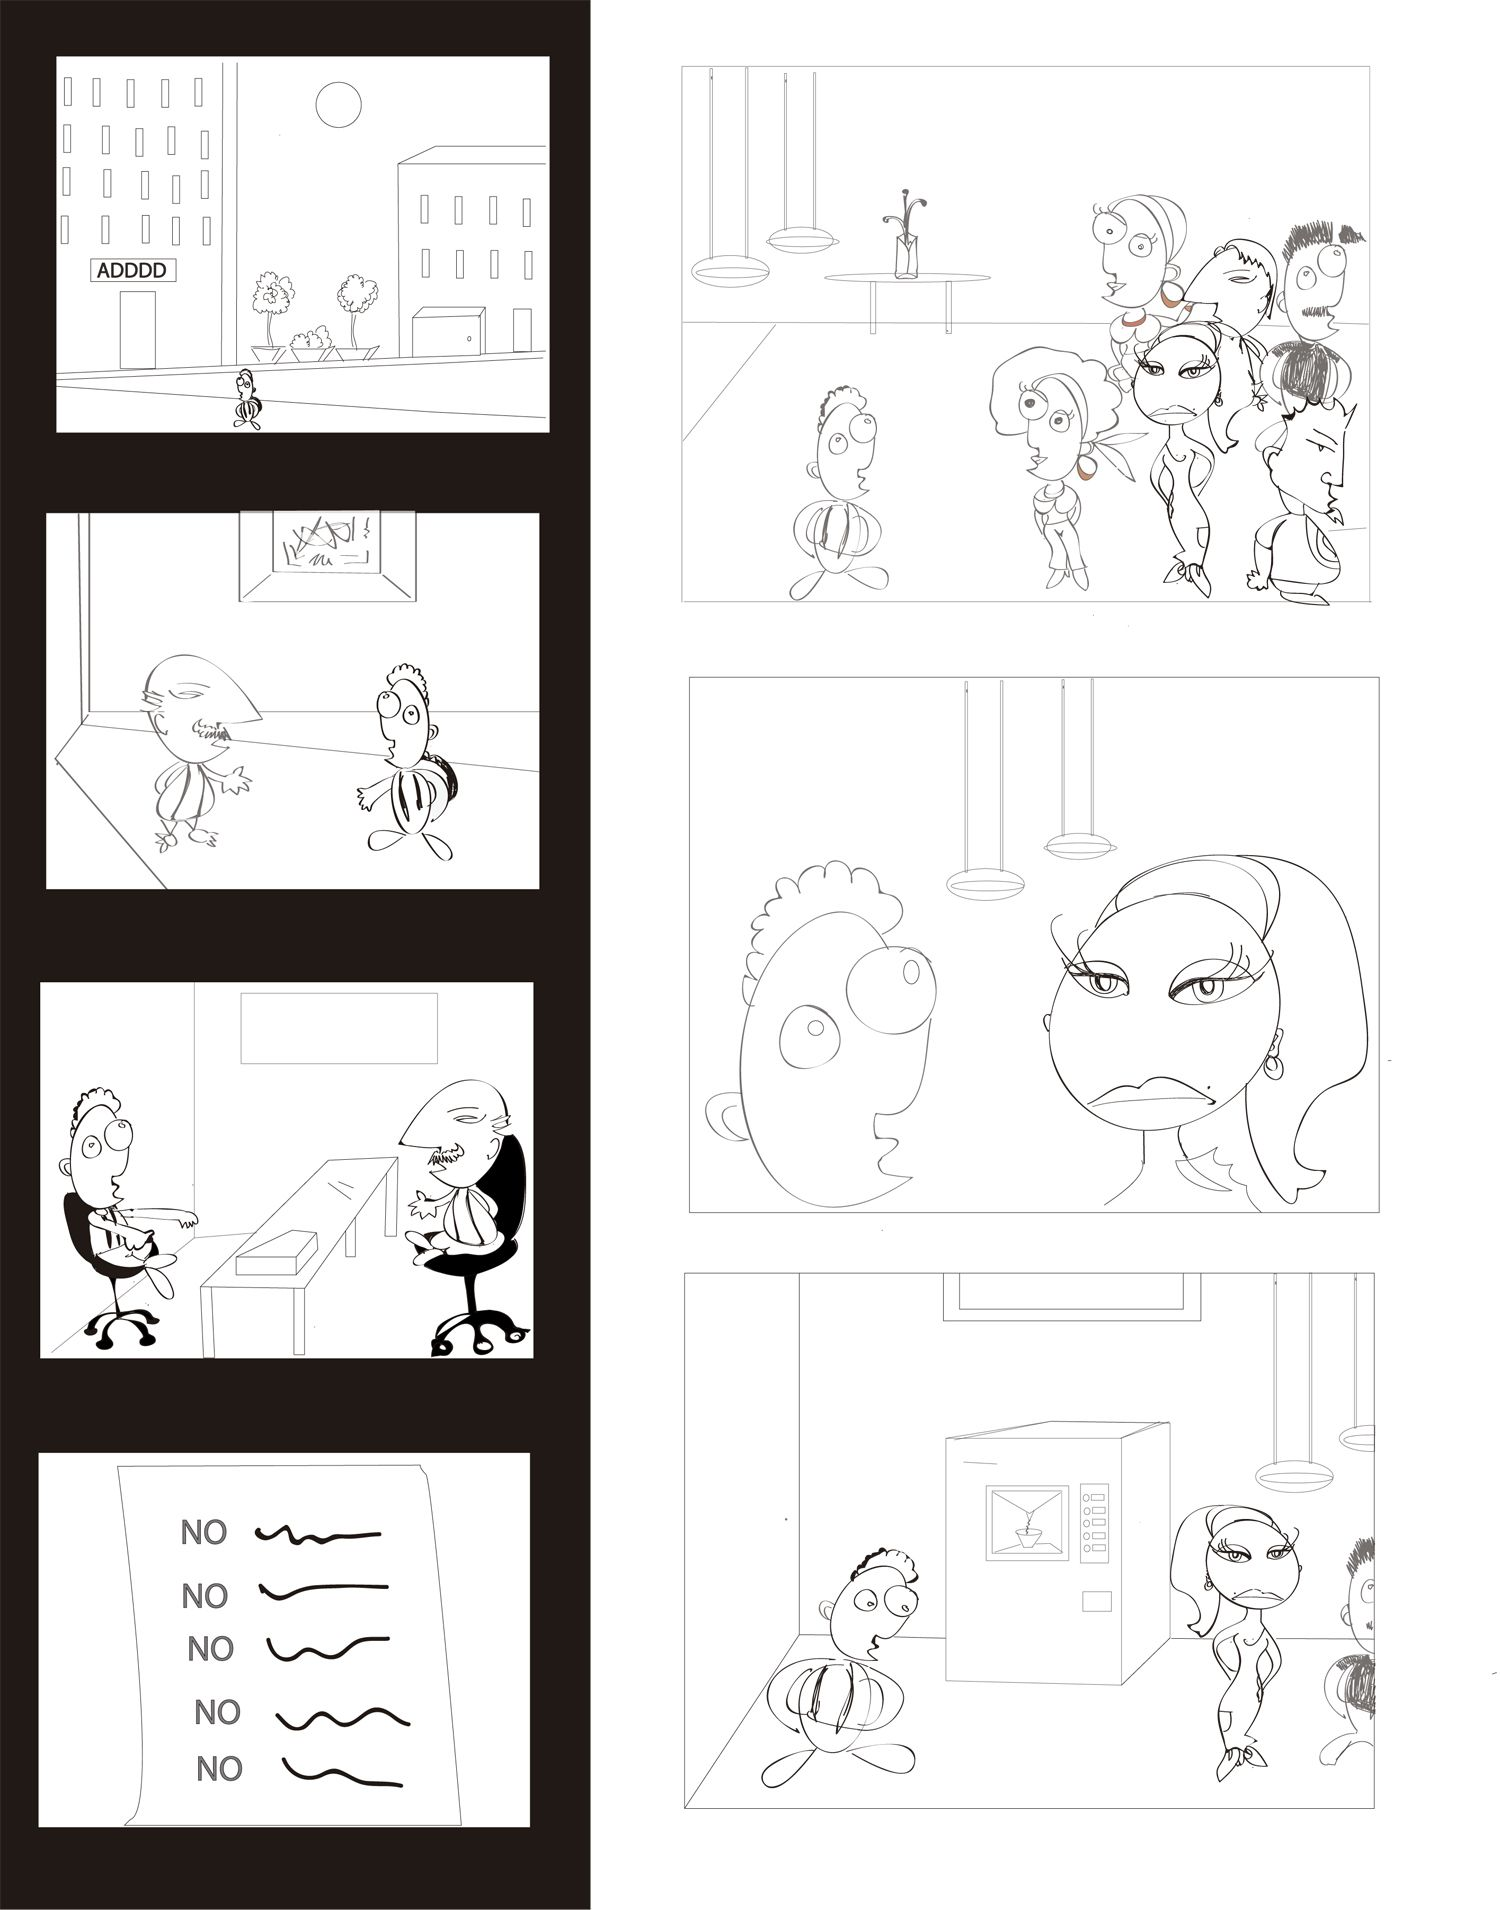 Sketching A Comic